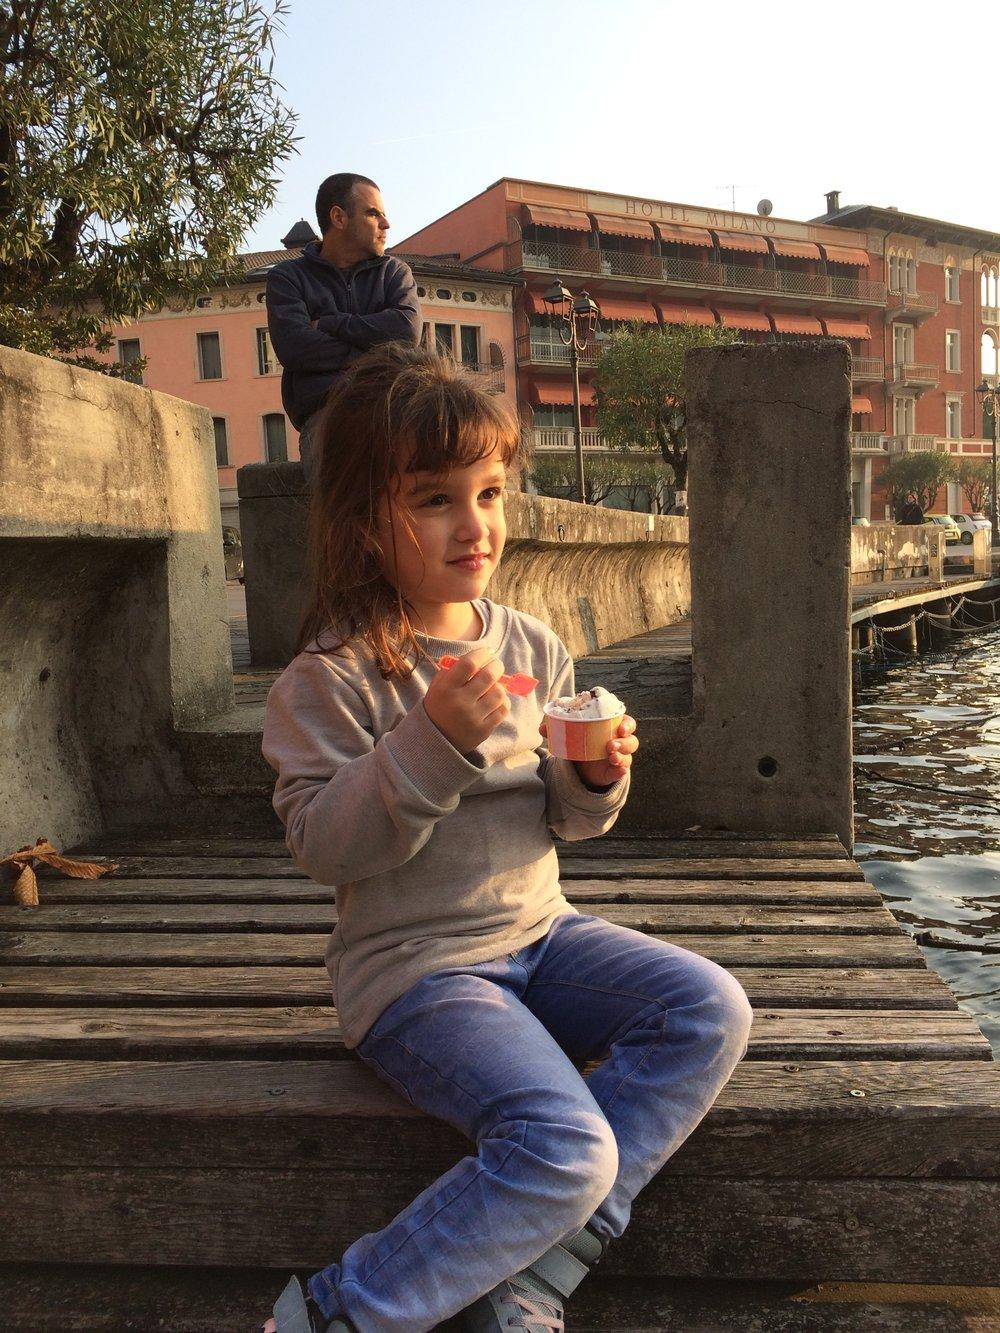 ice-cream-by-the-lake-garda.JPG